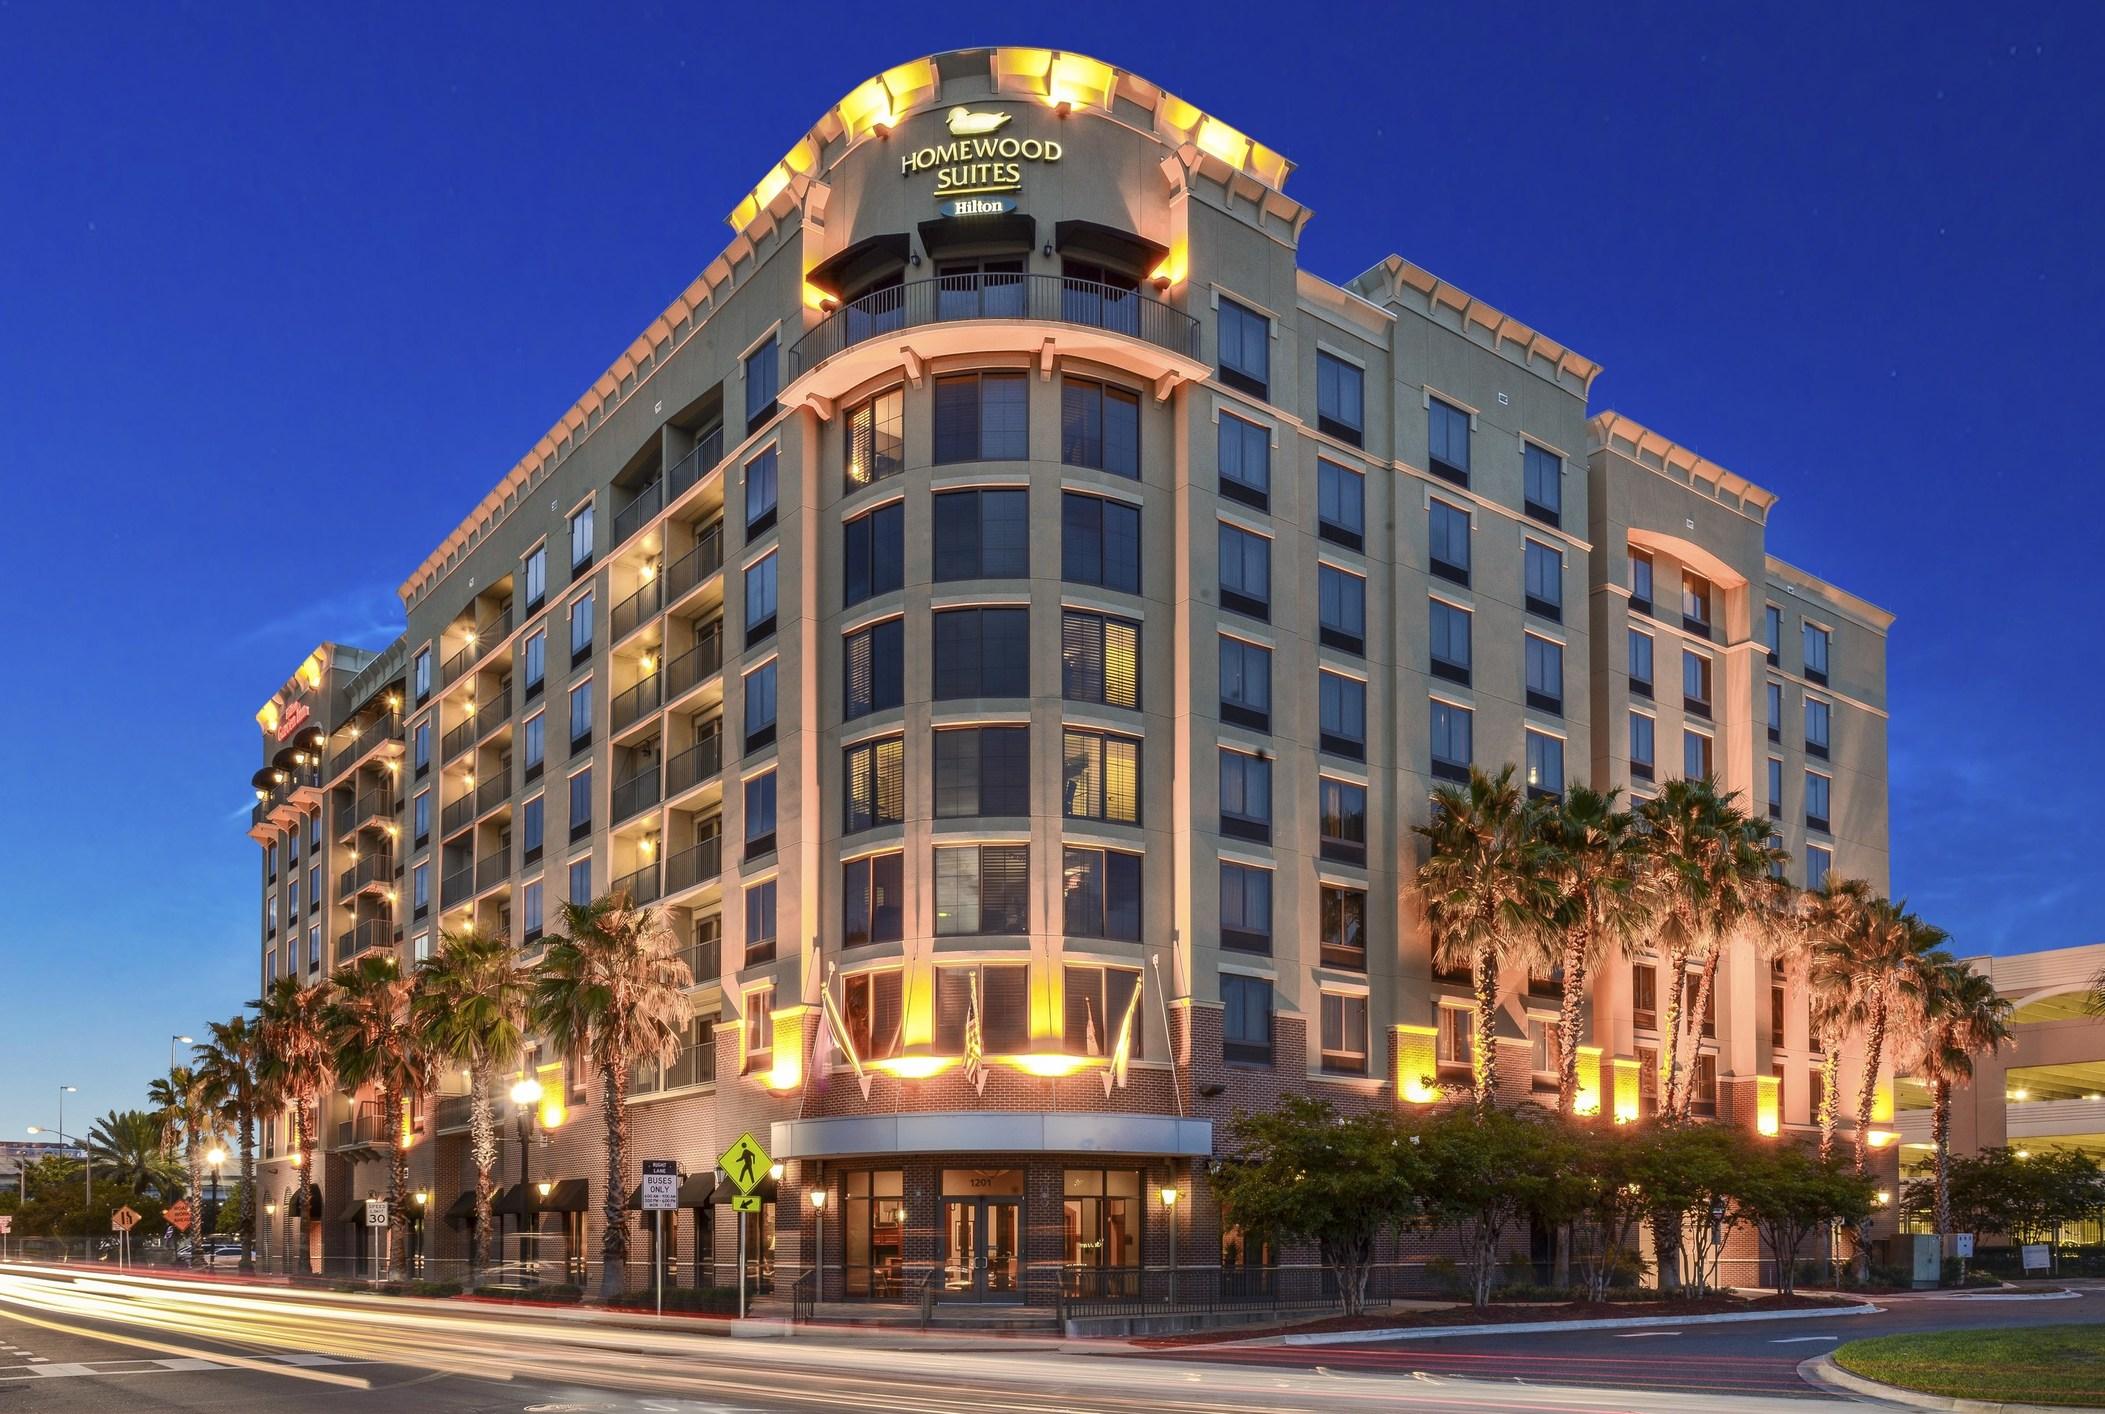 Lingerfelt commonwealth acquires hilton dual branded hotel in downtown jacksonville florida for Hilton garden inn jacksonville nc